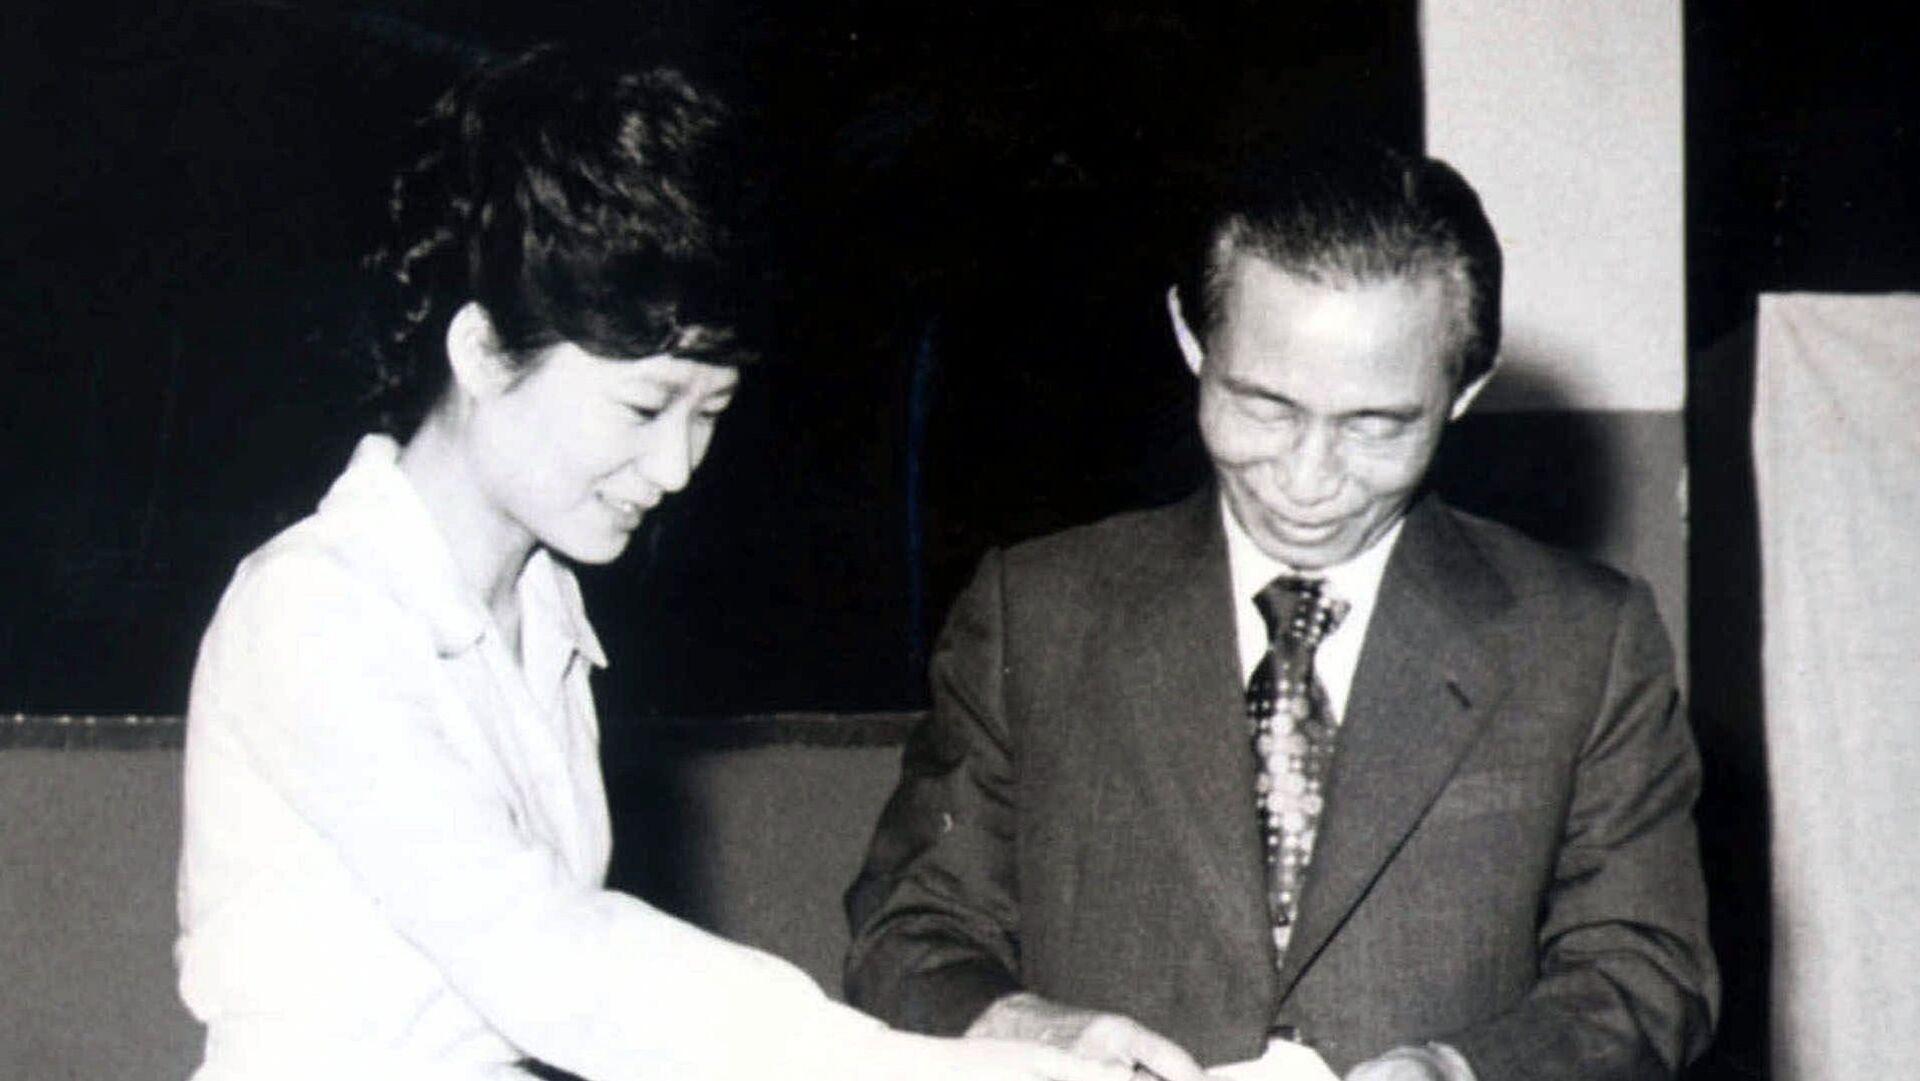 Пак Кын Хе и ее отец Пак Чон Хи. 1977 год  - РИА Новости, 1920, 26.10.2020